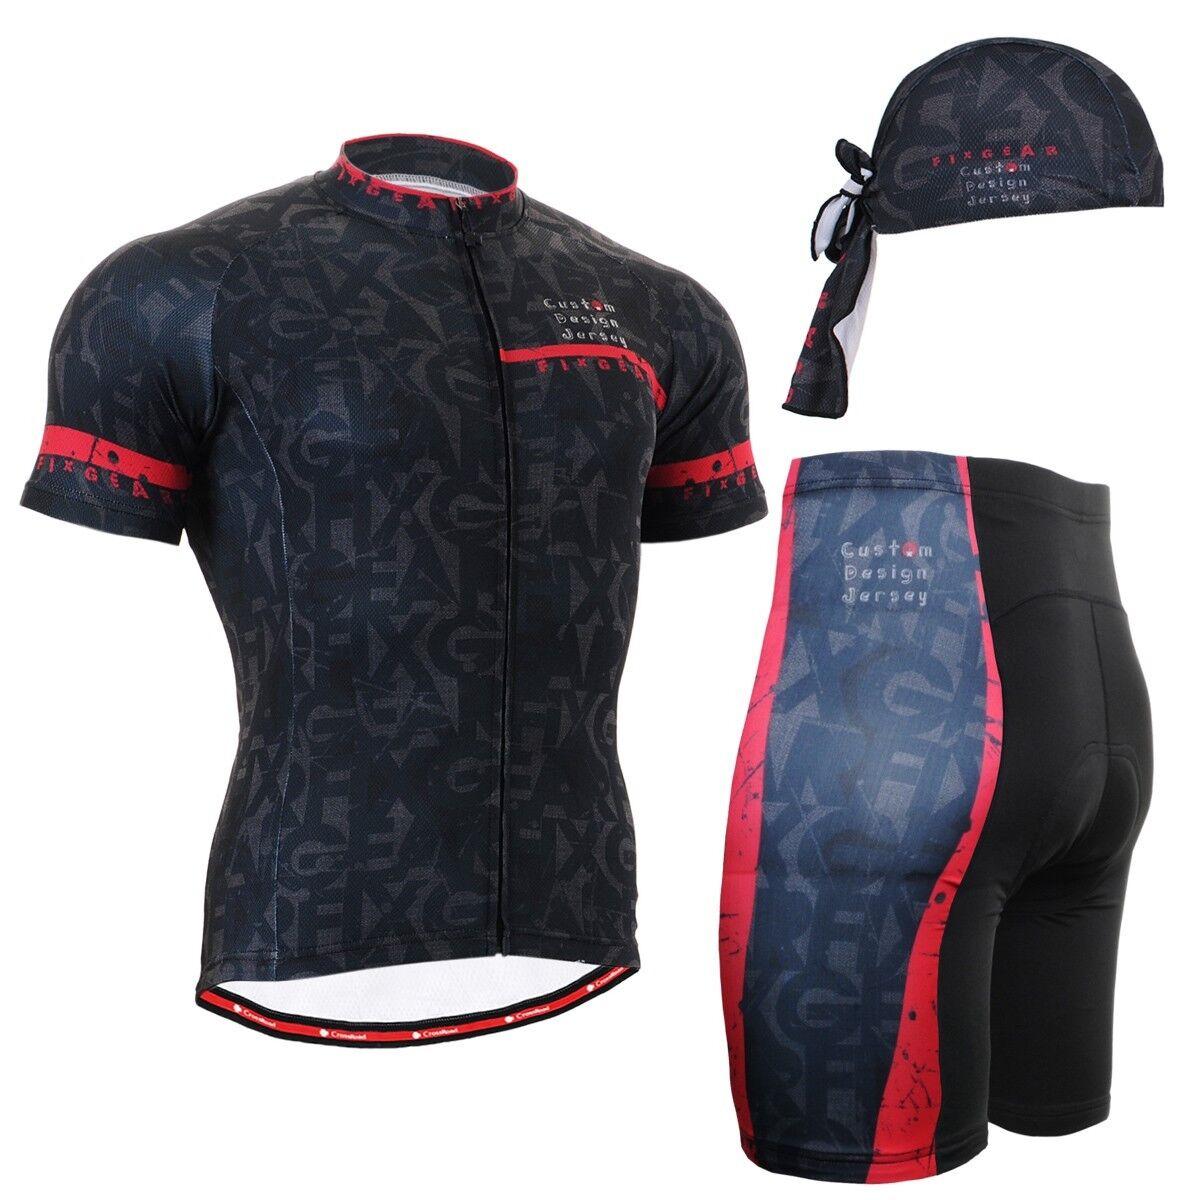 Fixgear CS - g602, suéteres para bicicletas, calzoncillos, bicicletas MTB, BMX, regalos de beanie.